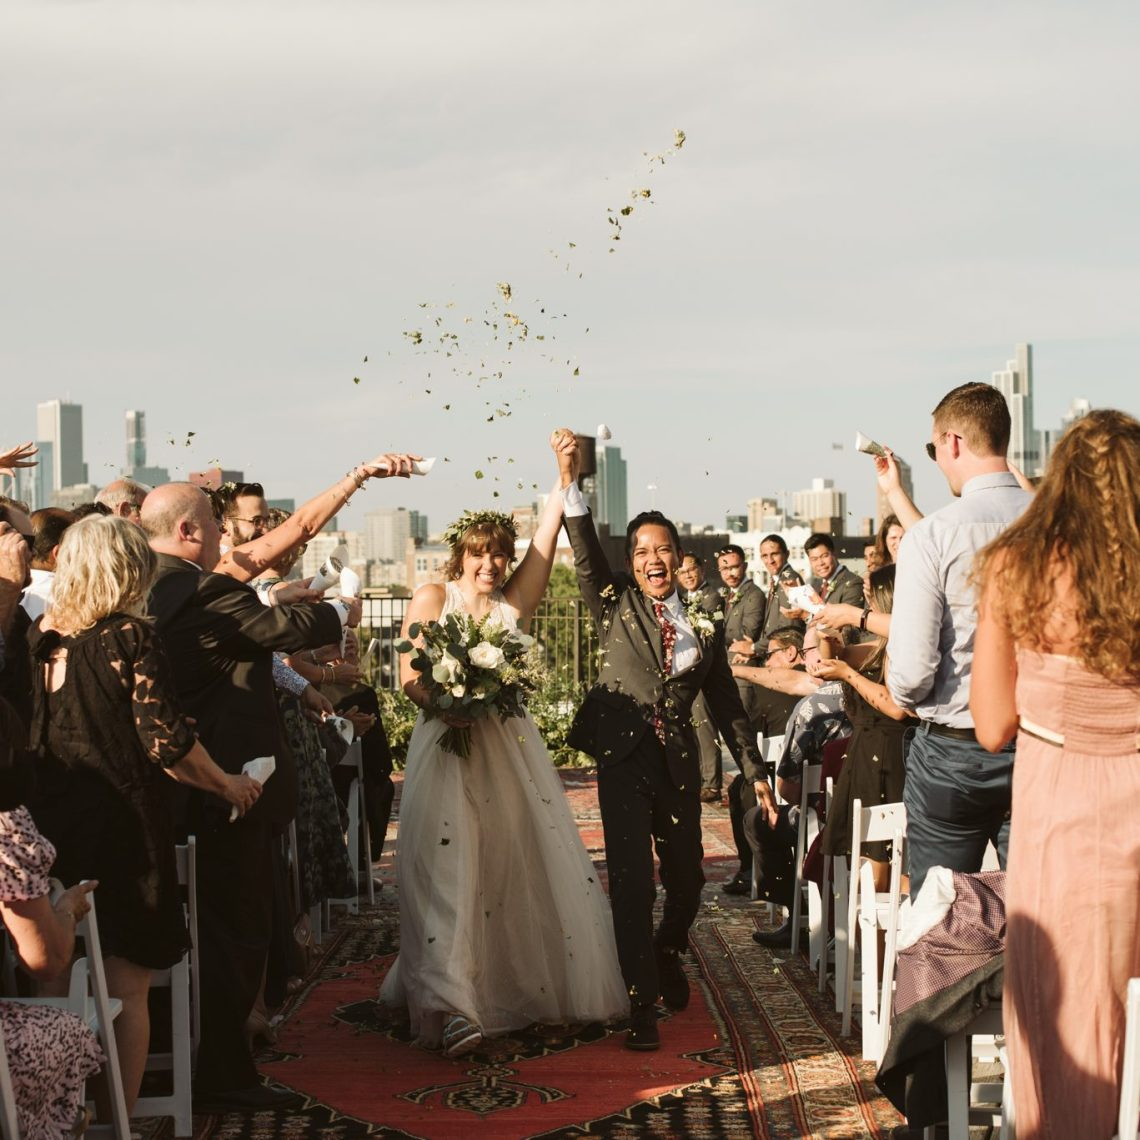 Wedicity Wedding & Event Planning